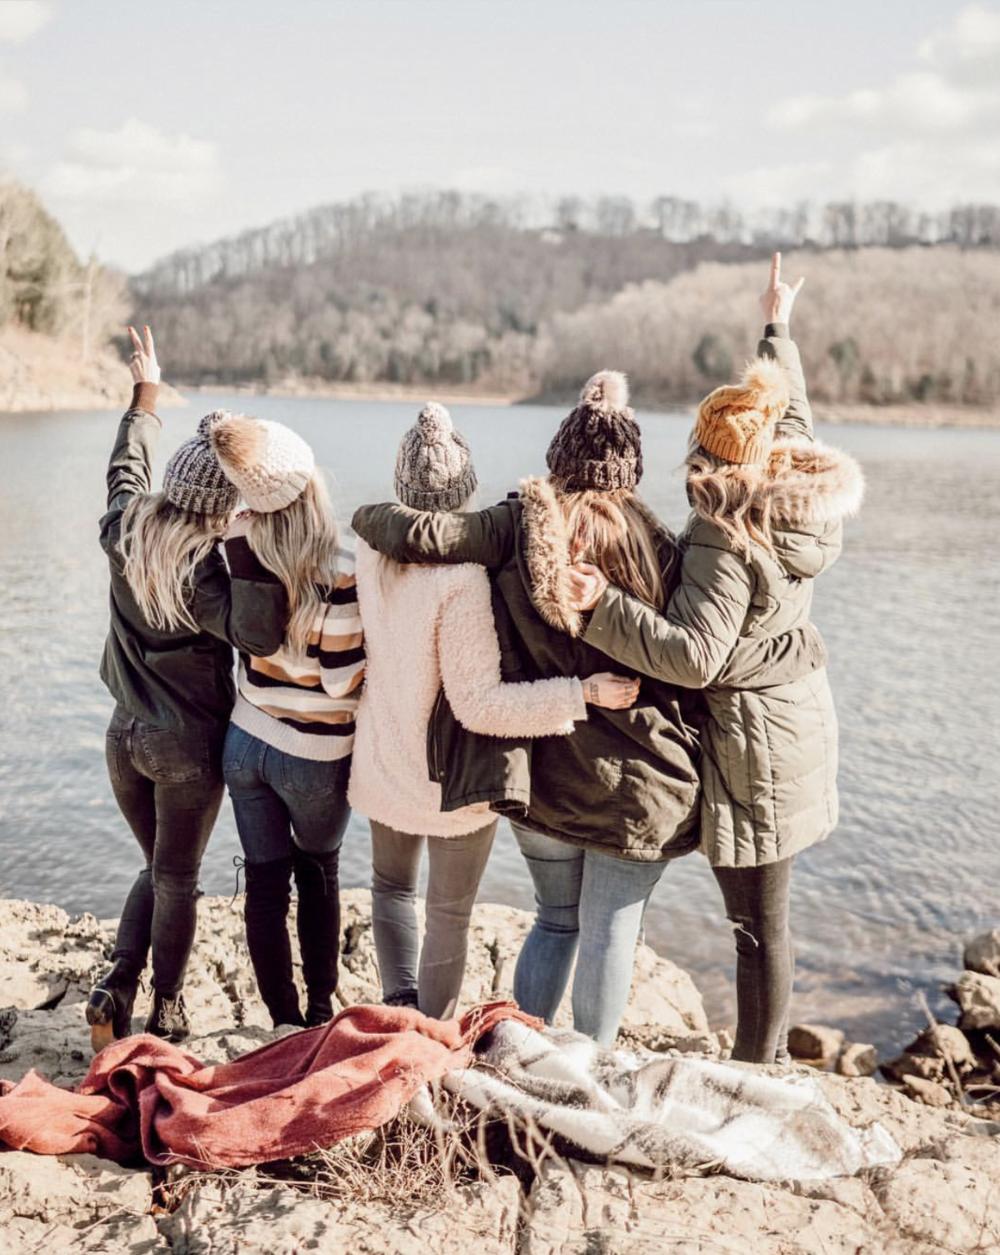 christmas-holiday-getaway-event-girls-trip-lake-womens-retreat-squad-goals-girl-power.jpg